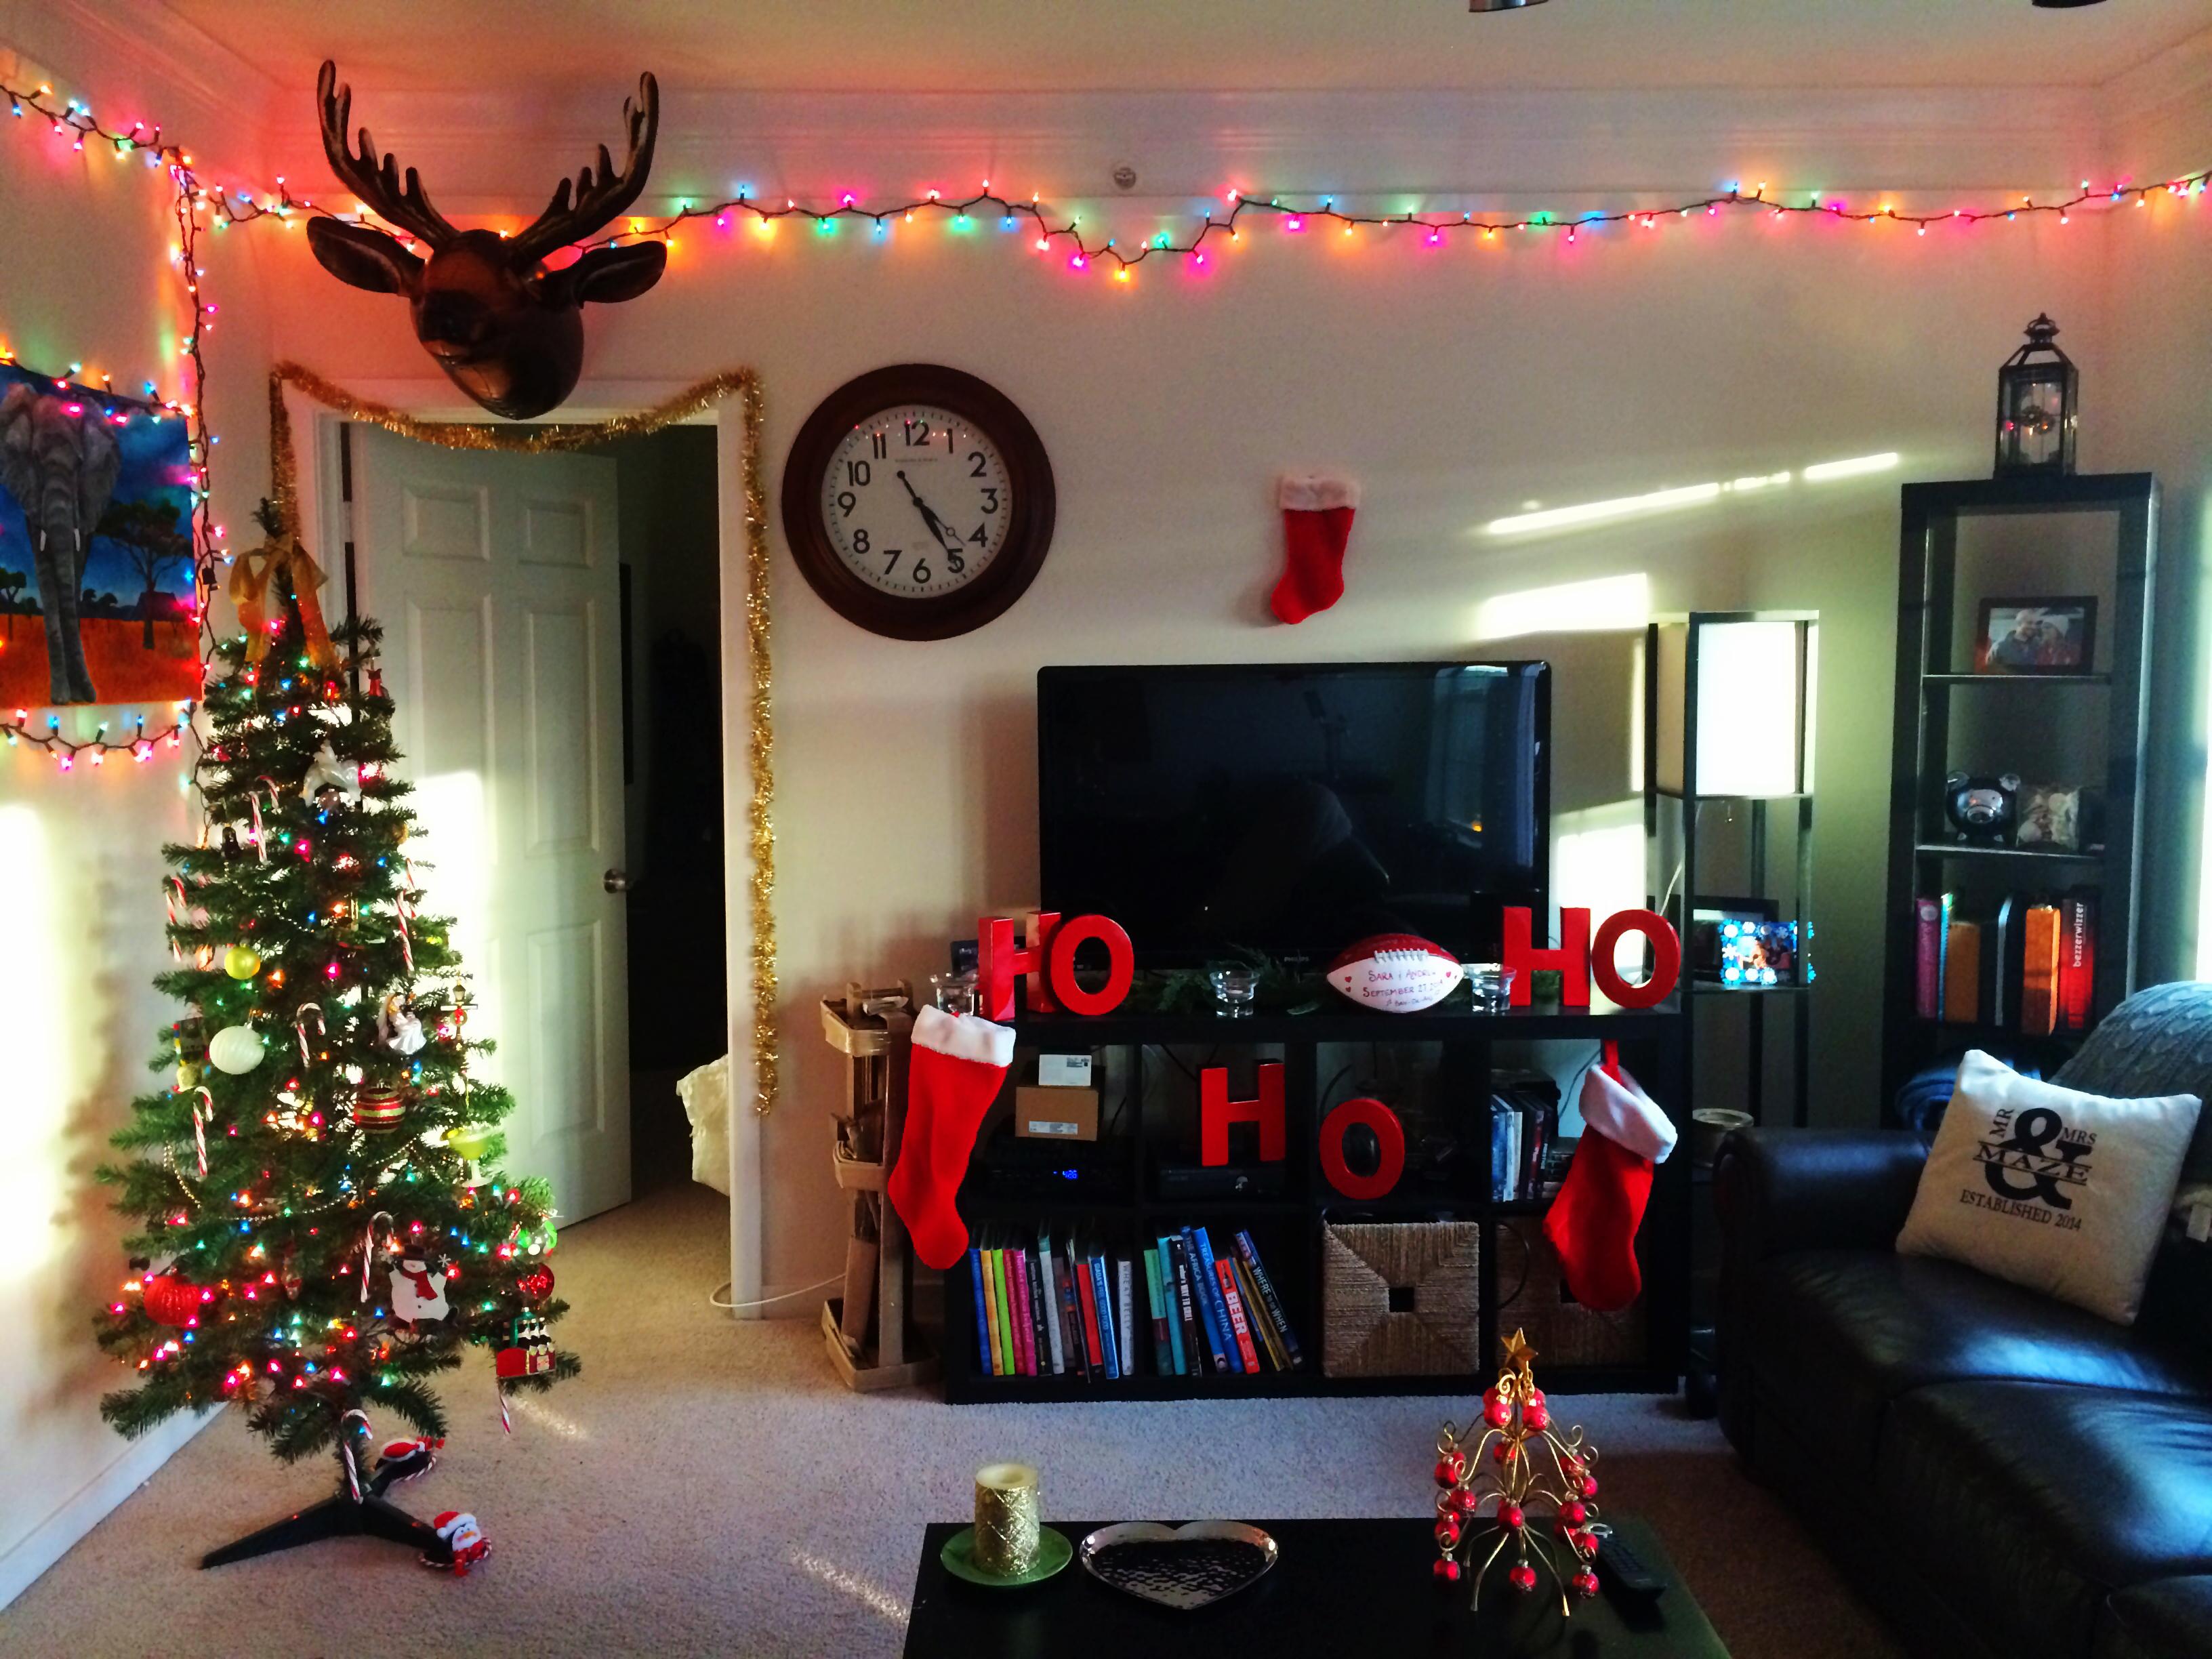 Stocking Stuffer Gifts 2014 | My Favorite Things